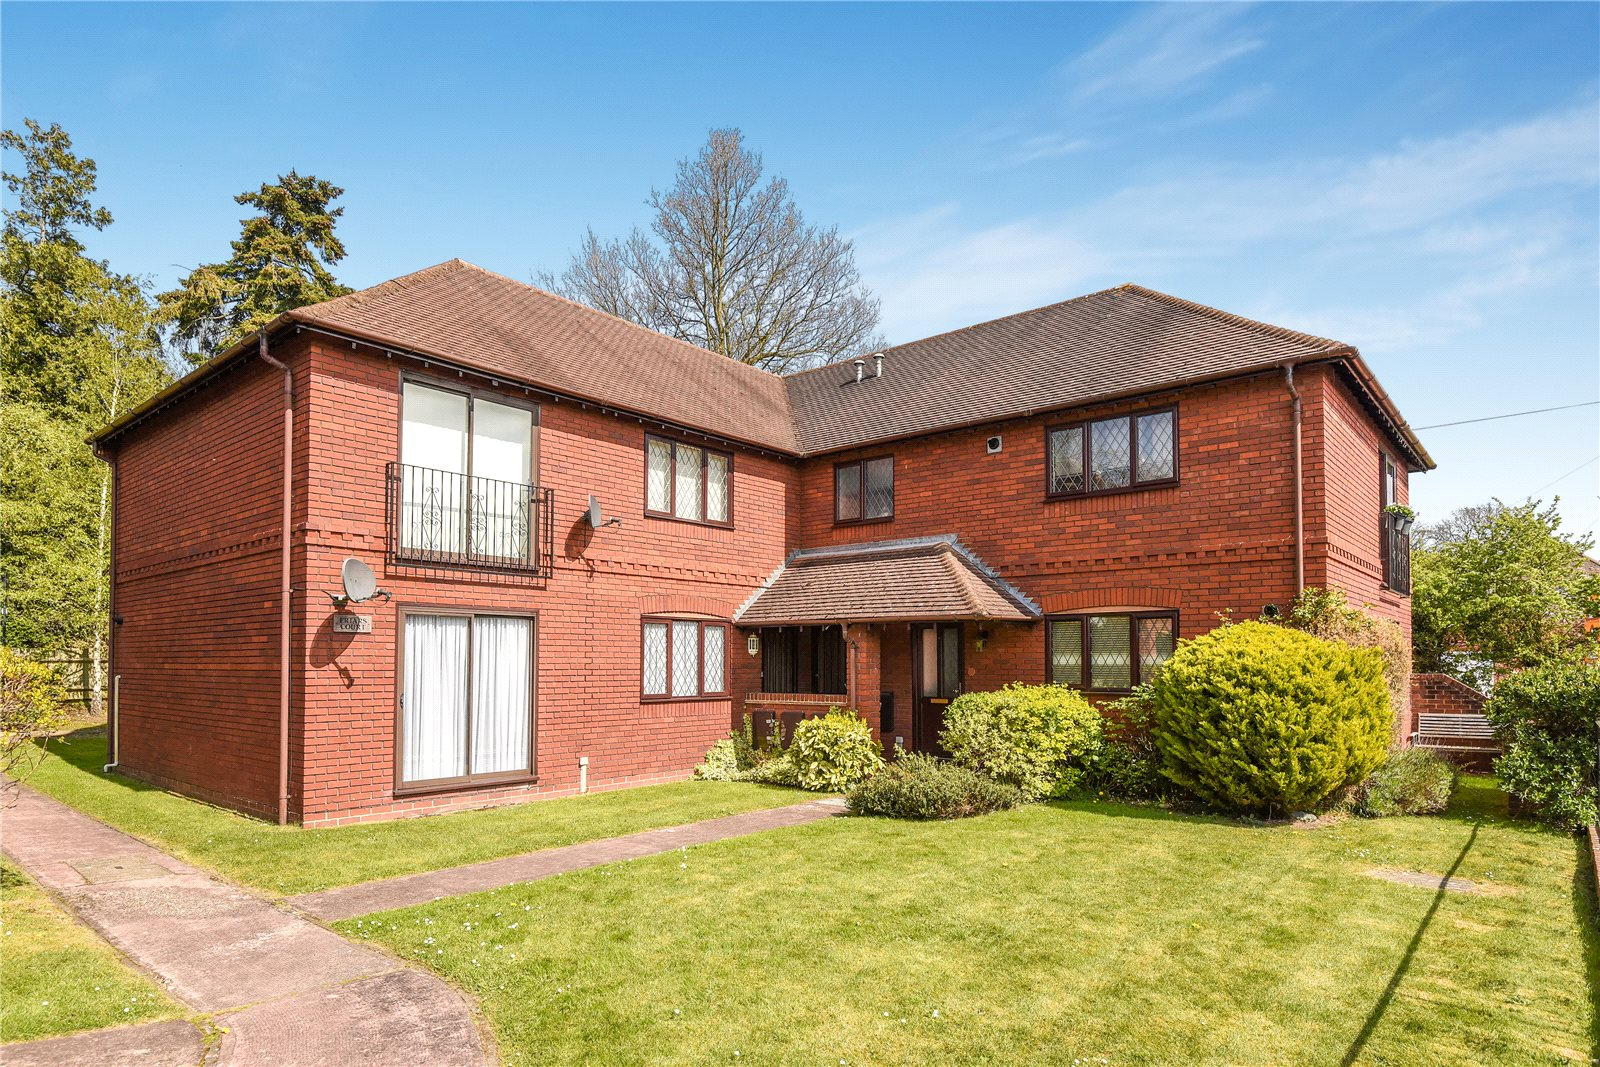 1 Bedroom Apartment Flat for sale in Friars Court, Lych Gate Close, Sandhurst, Berkshire, GU47